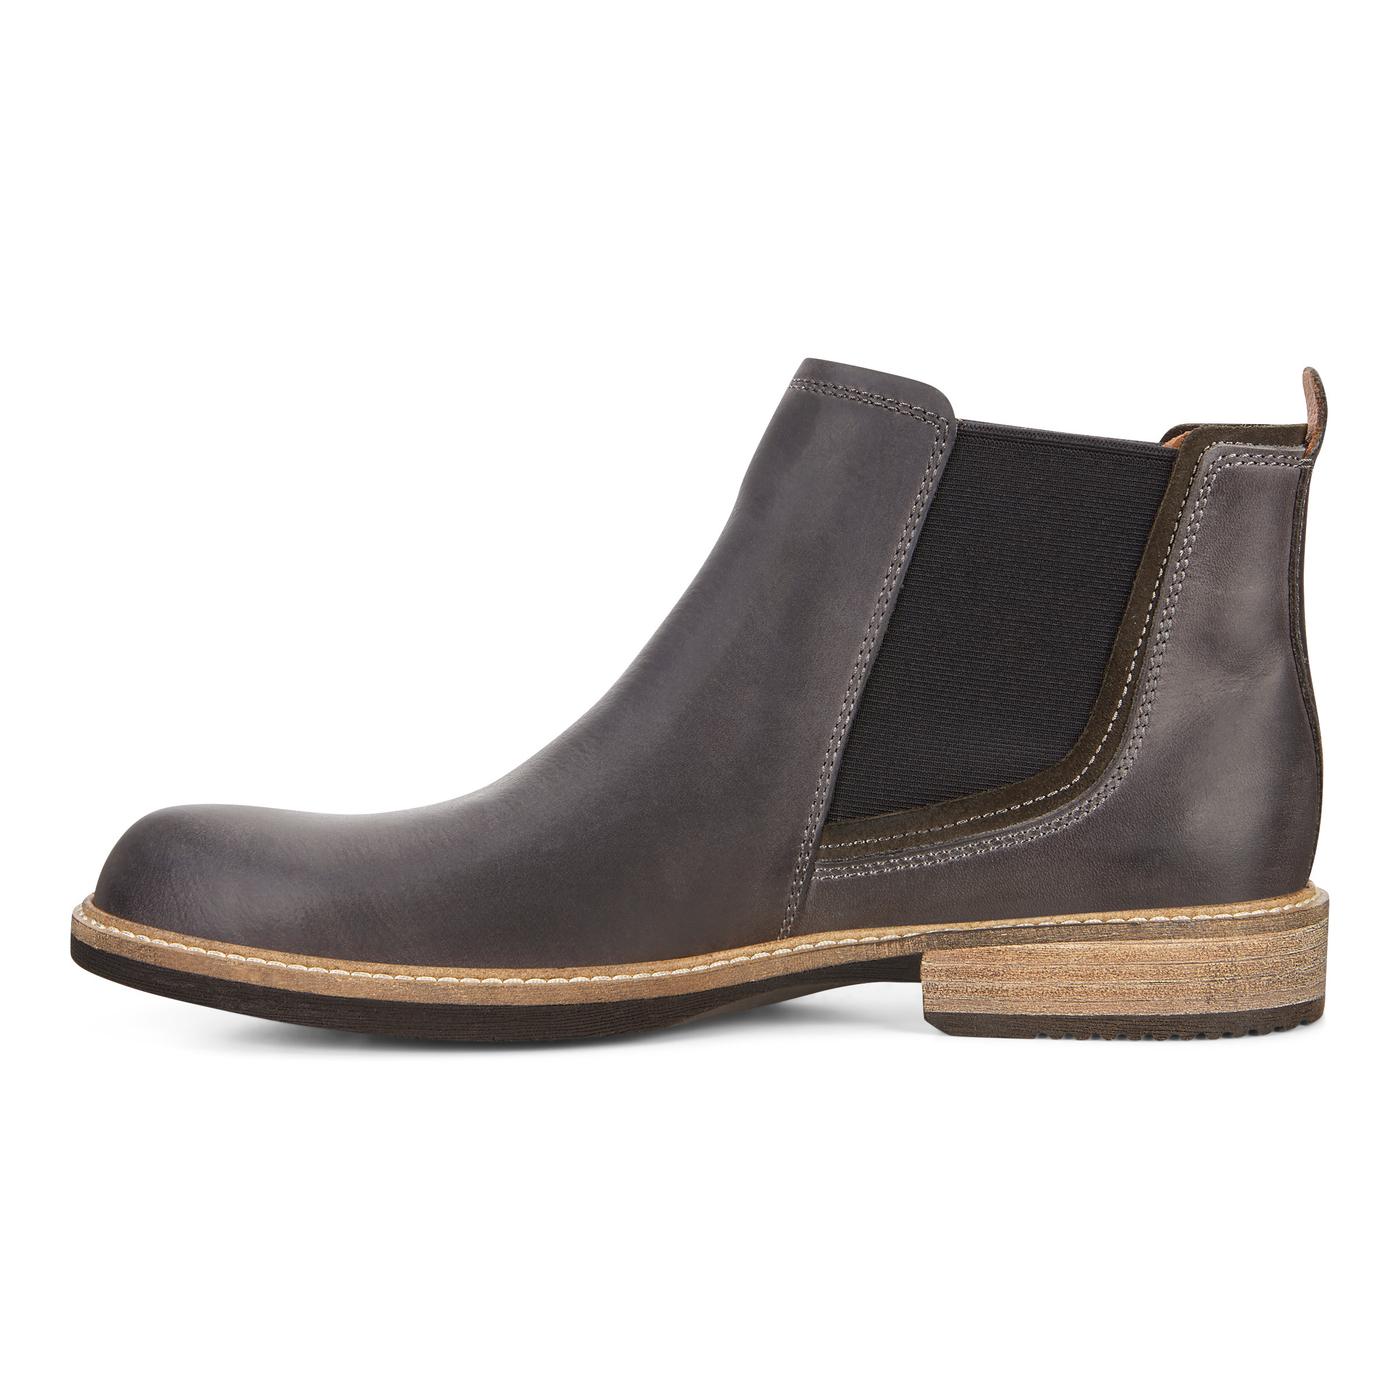 ECCO KENTON Chelsea Boot